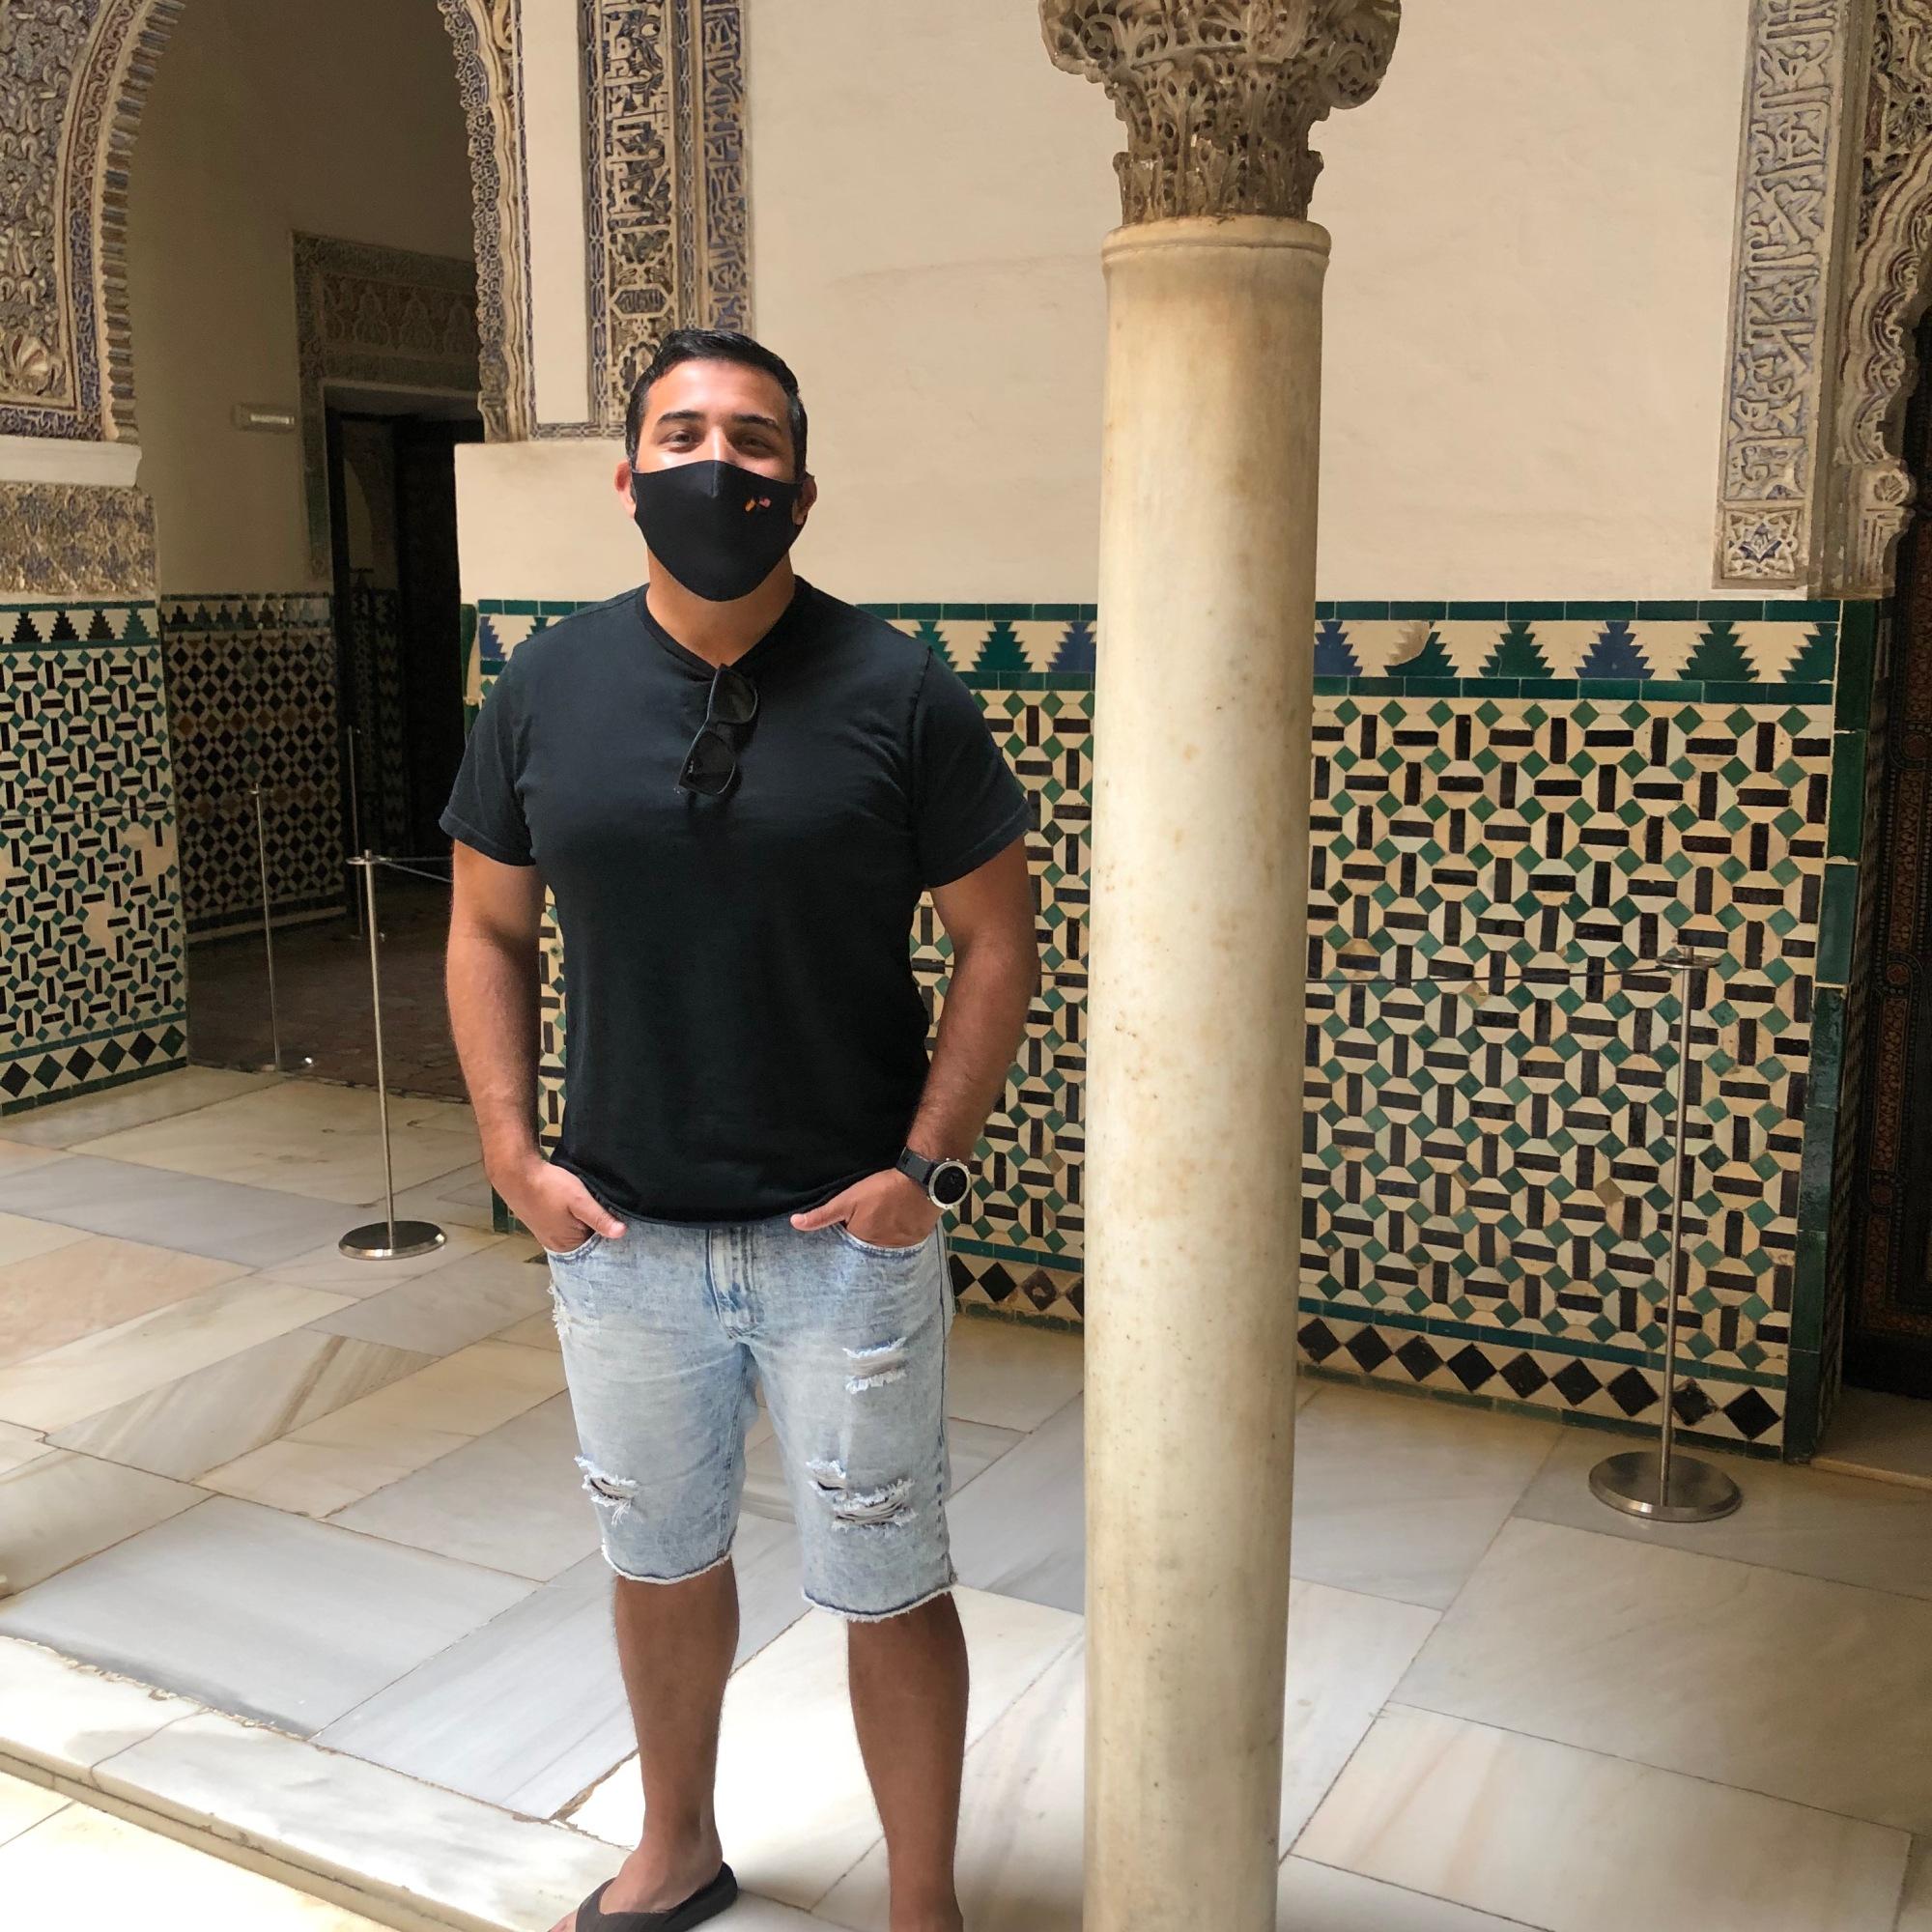 man standing next to a column in the Alcazar